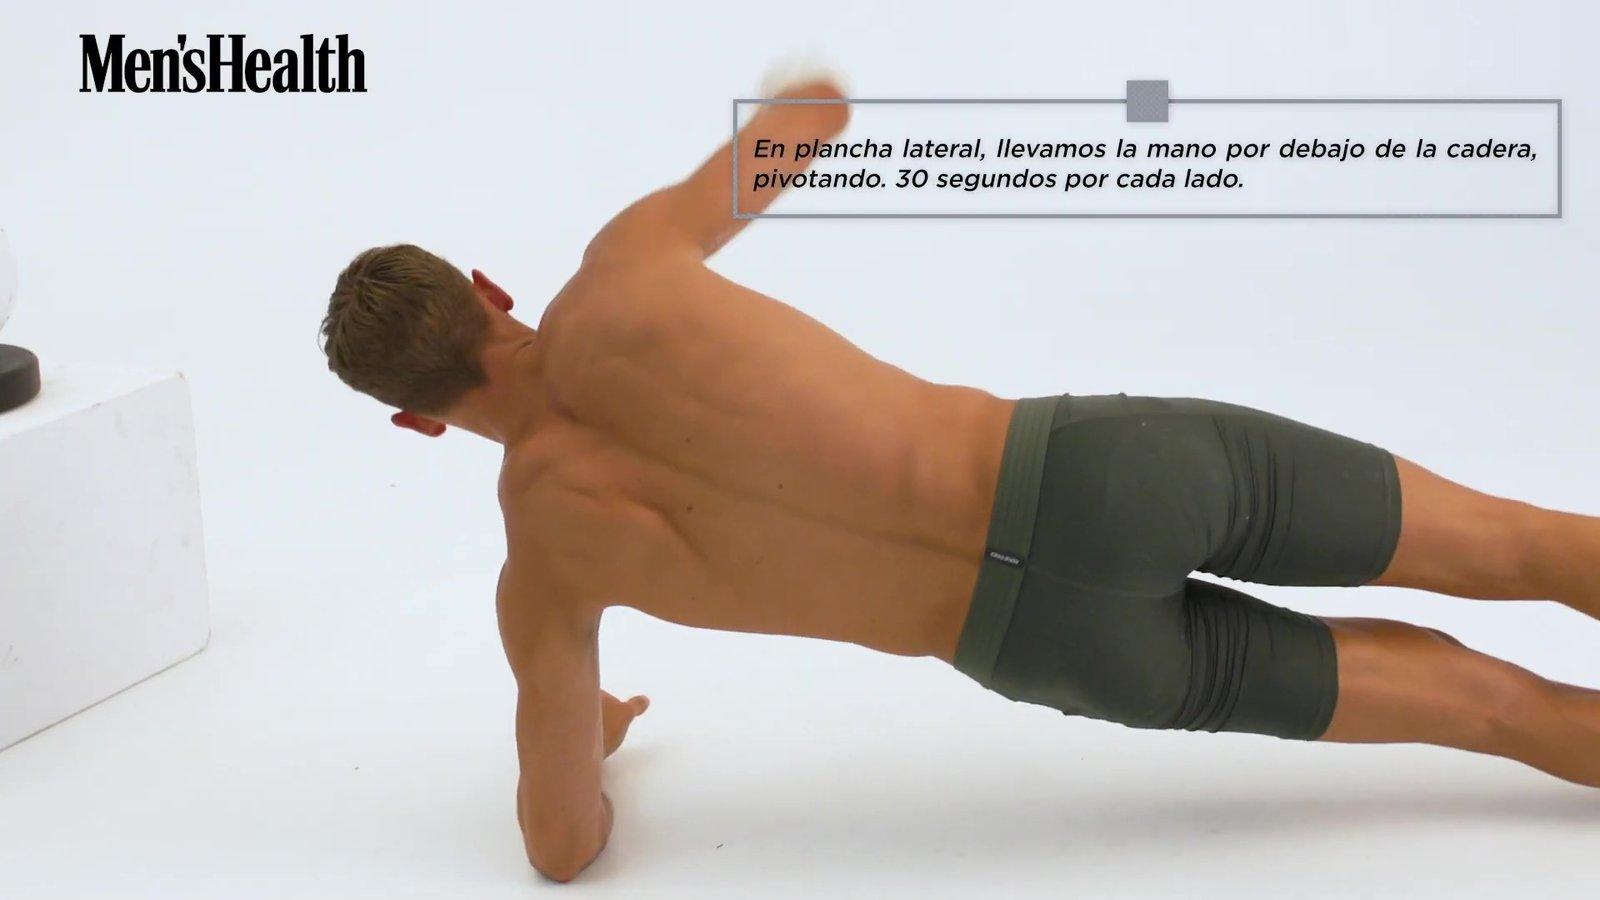 marcos-llorente-mens-health-2